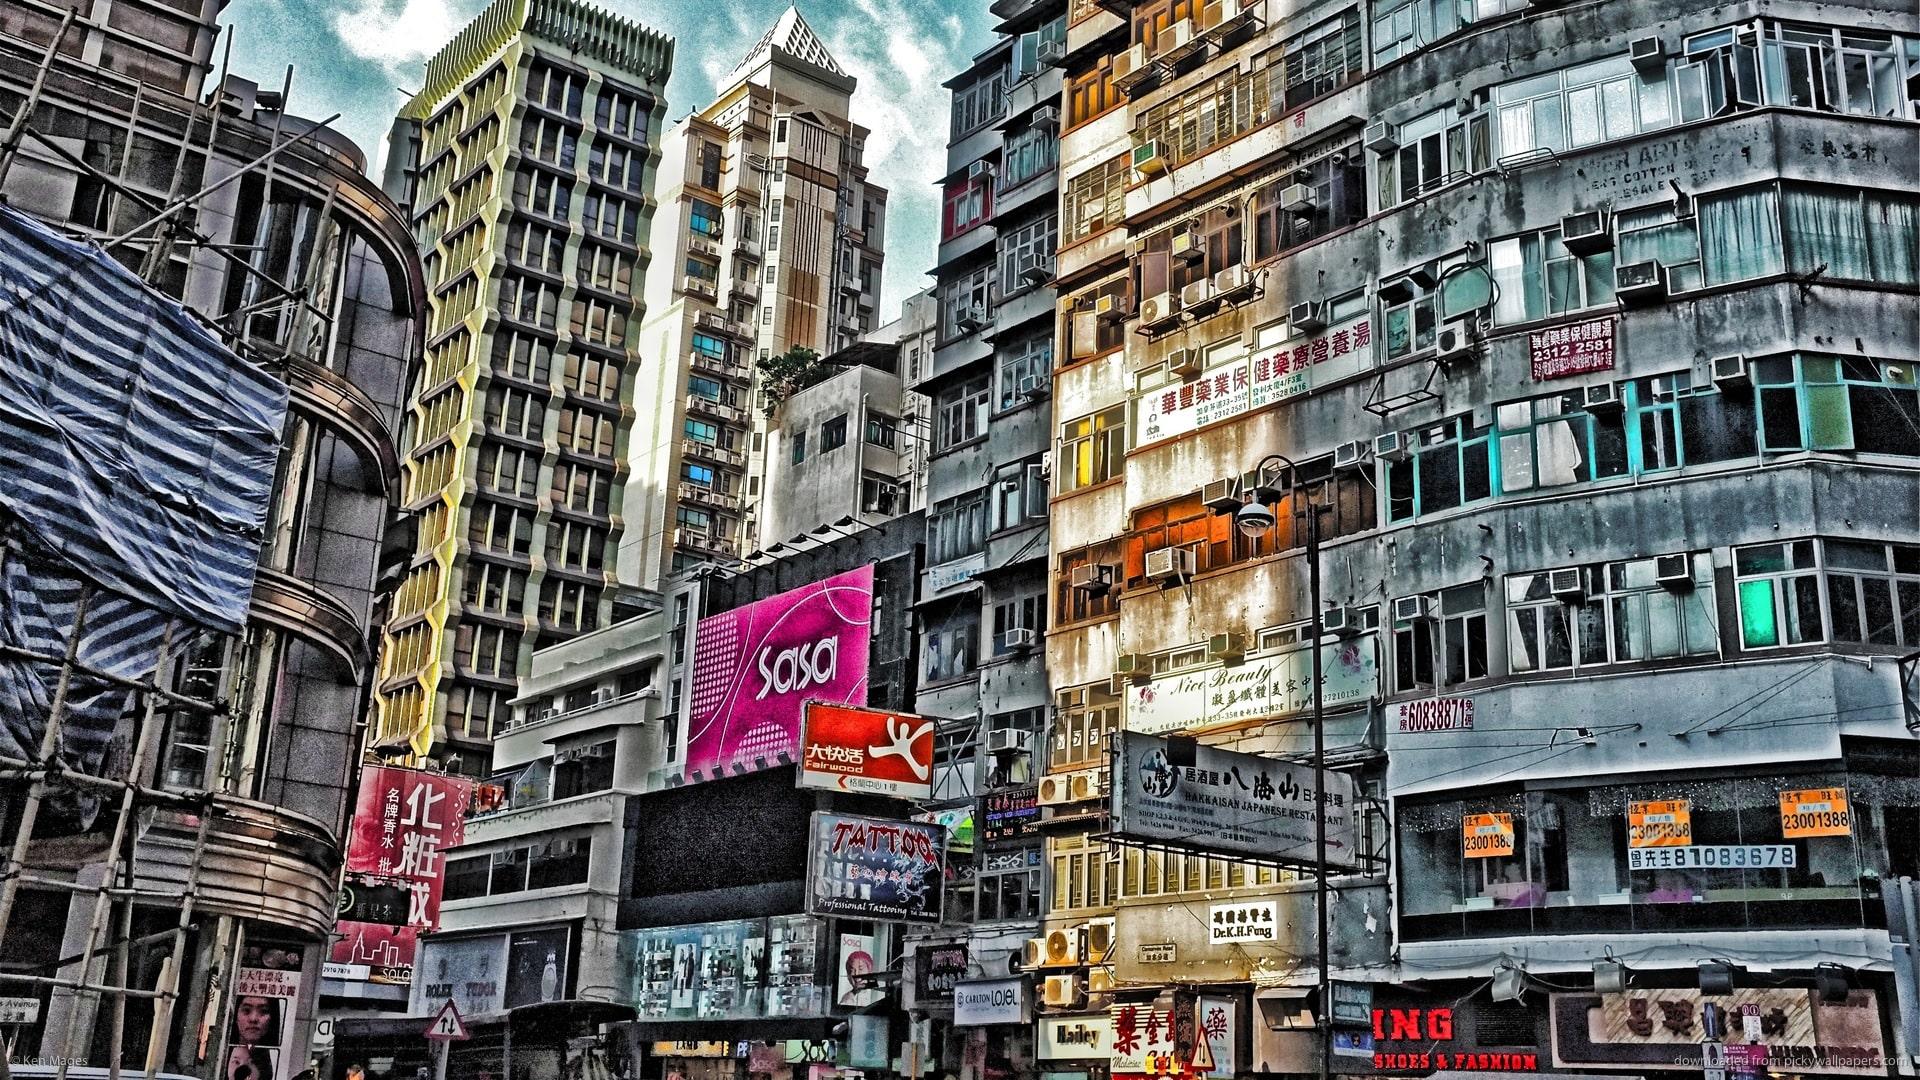 Hong Kong widescreen